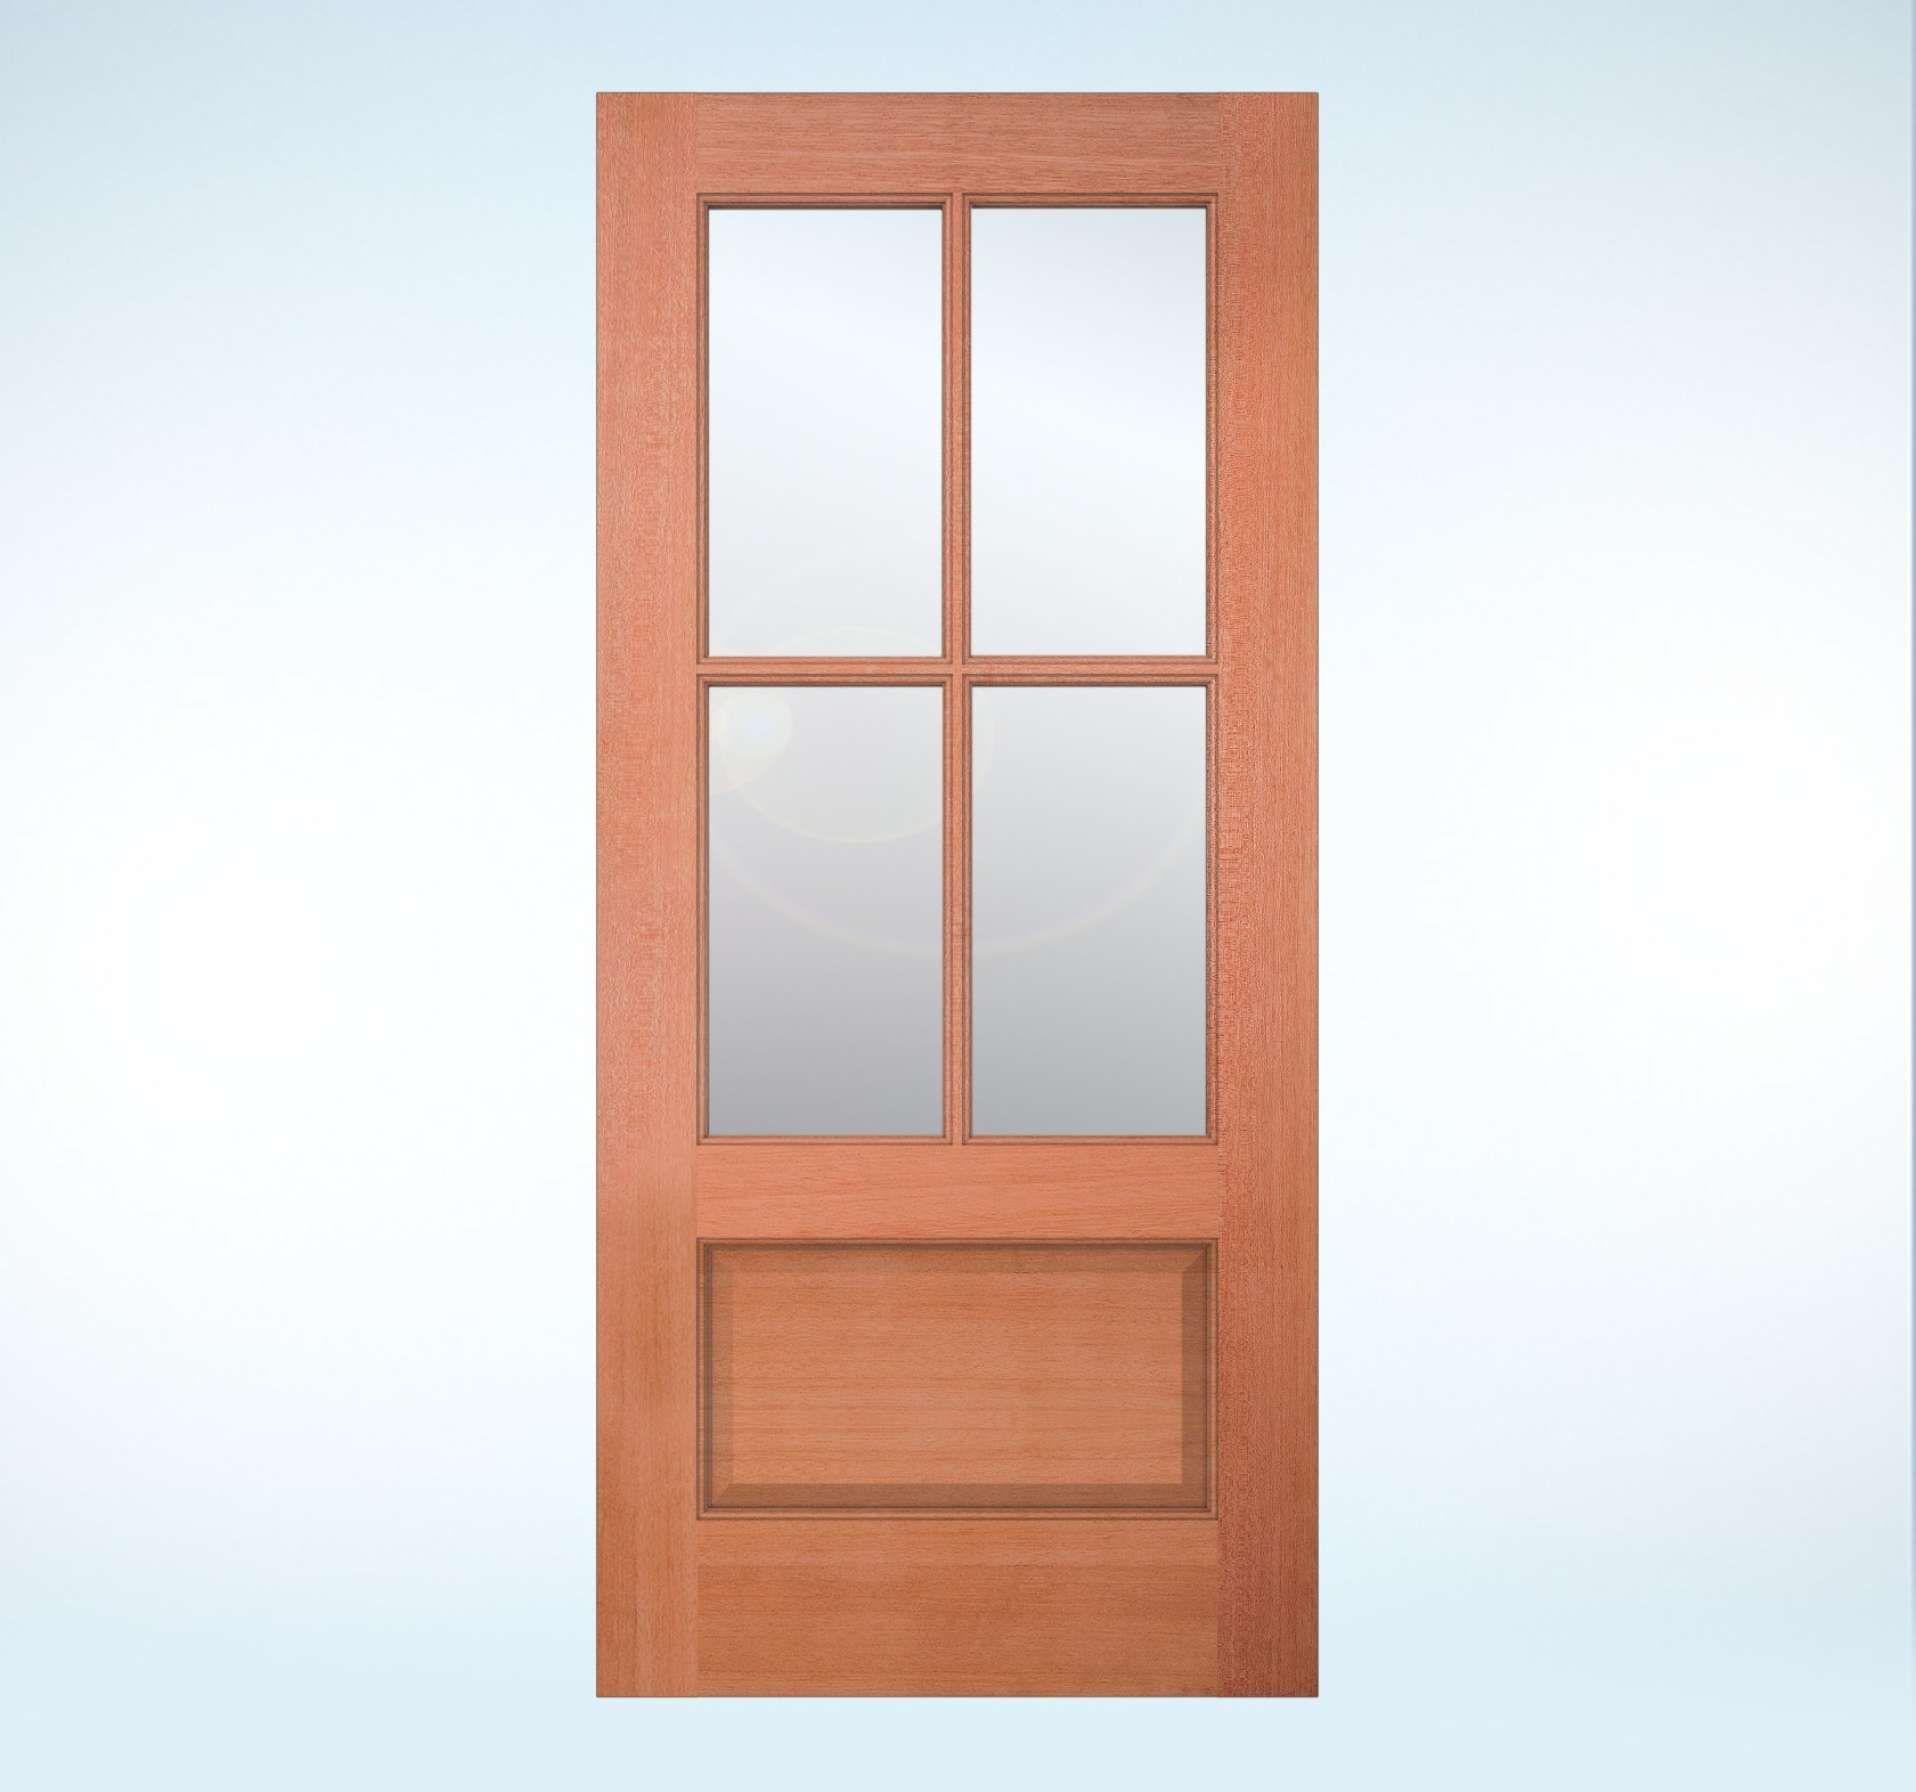 Jeld Wen Model 5104 Wood Glass Panel Exterior Door In Meranti Mahogany For The Back Exterior